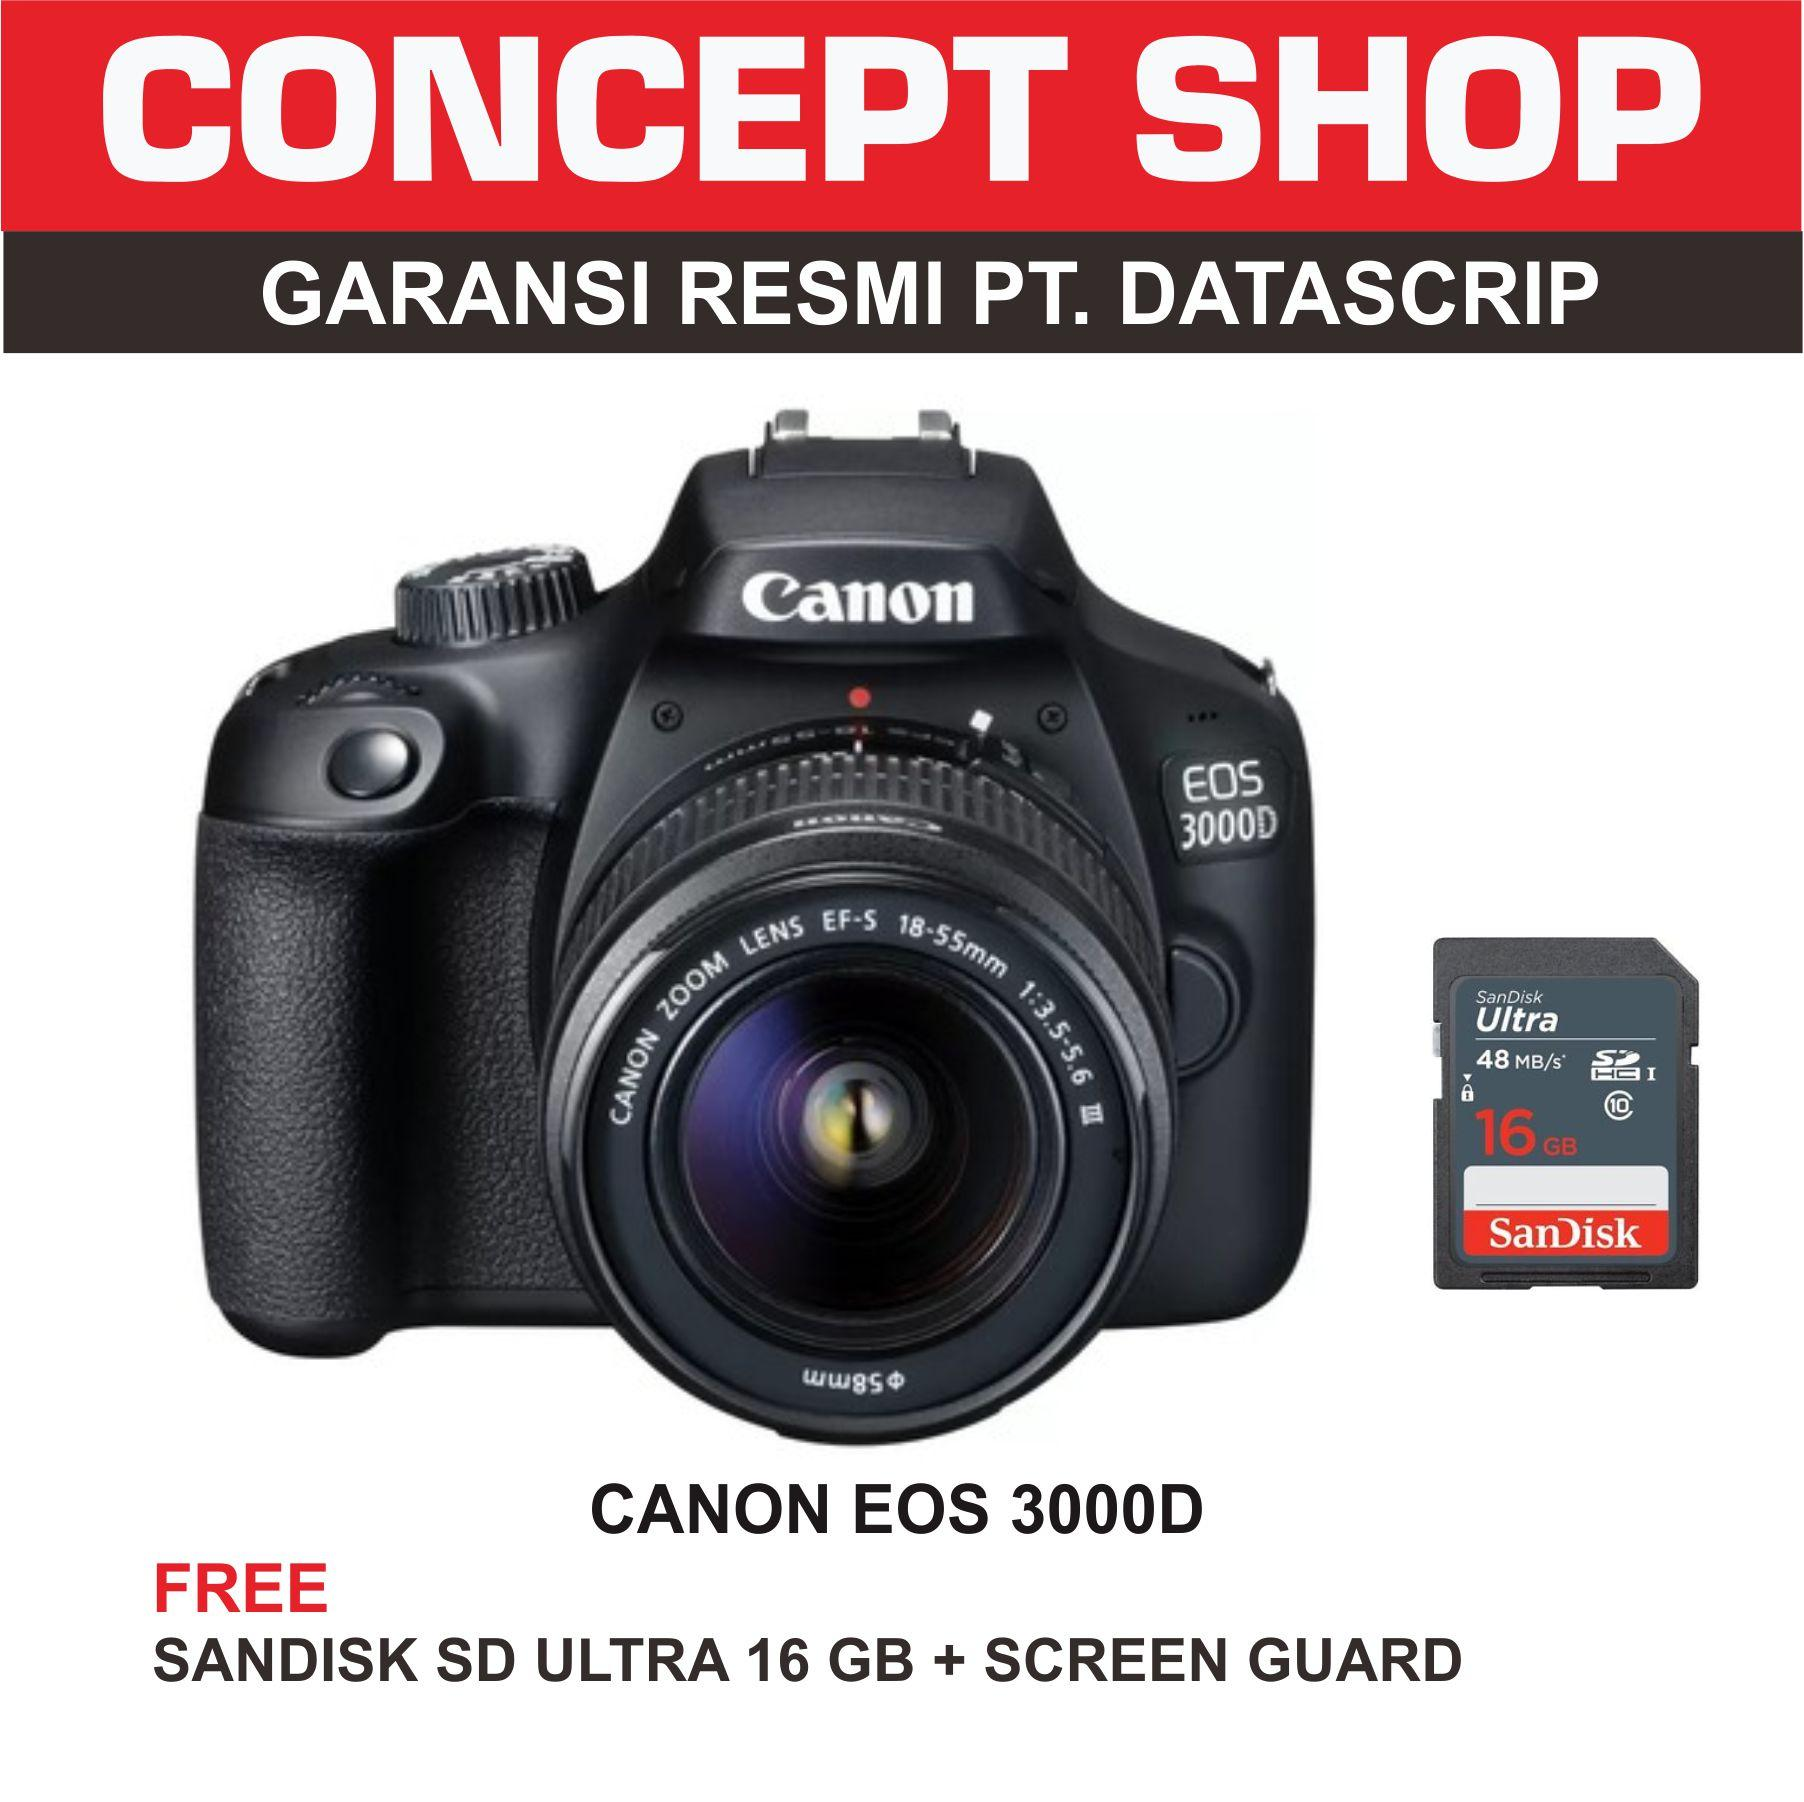 Kamera Prosumer Canon Terbaik Powershot Sx430 Is Eos 3000d Kit 18 55mm F35 56 Iii 3000 D